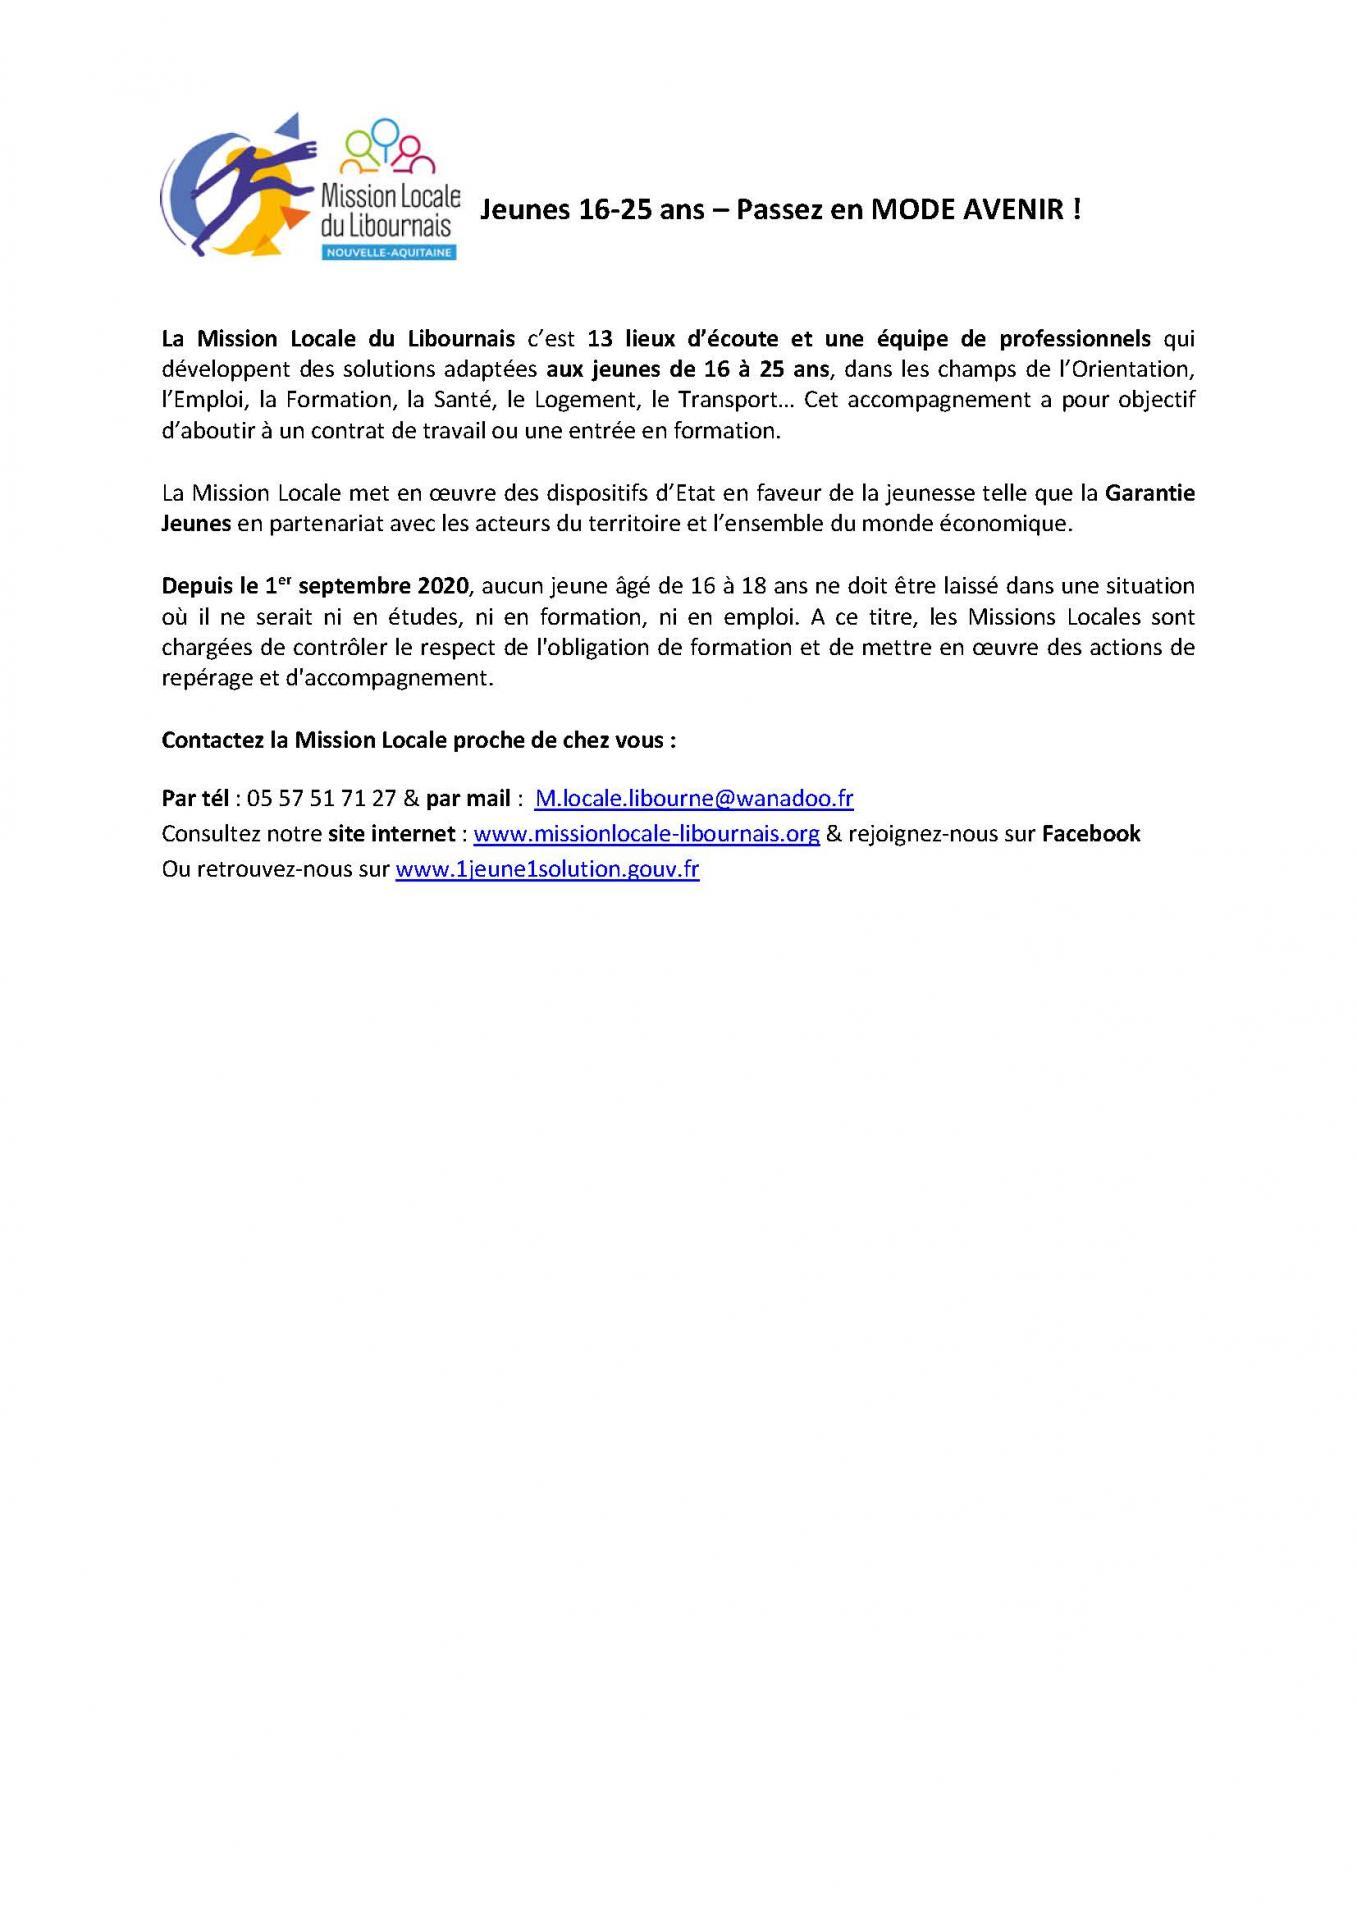 Presentation ml pour bulletin municipaux 2020